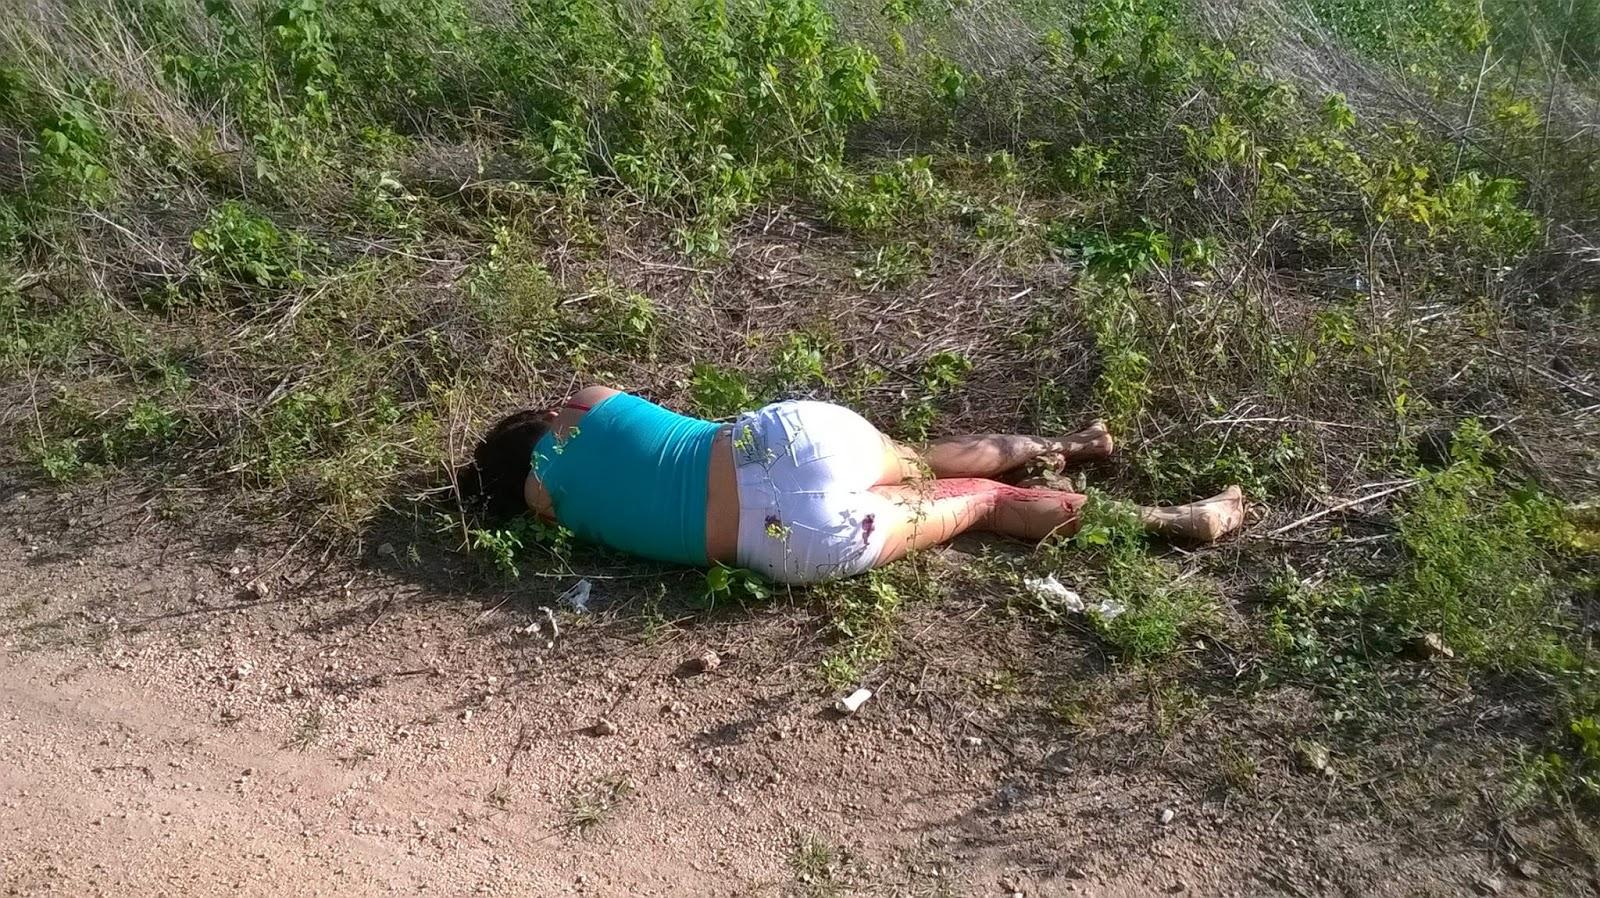 Fotos isabella nardoni morta 43